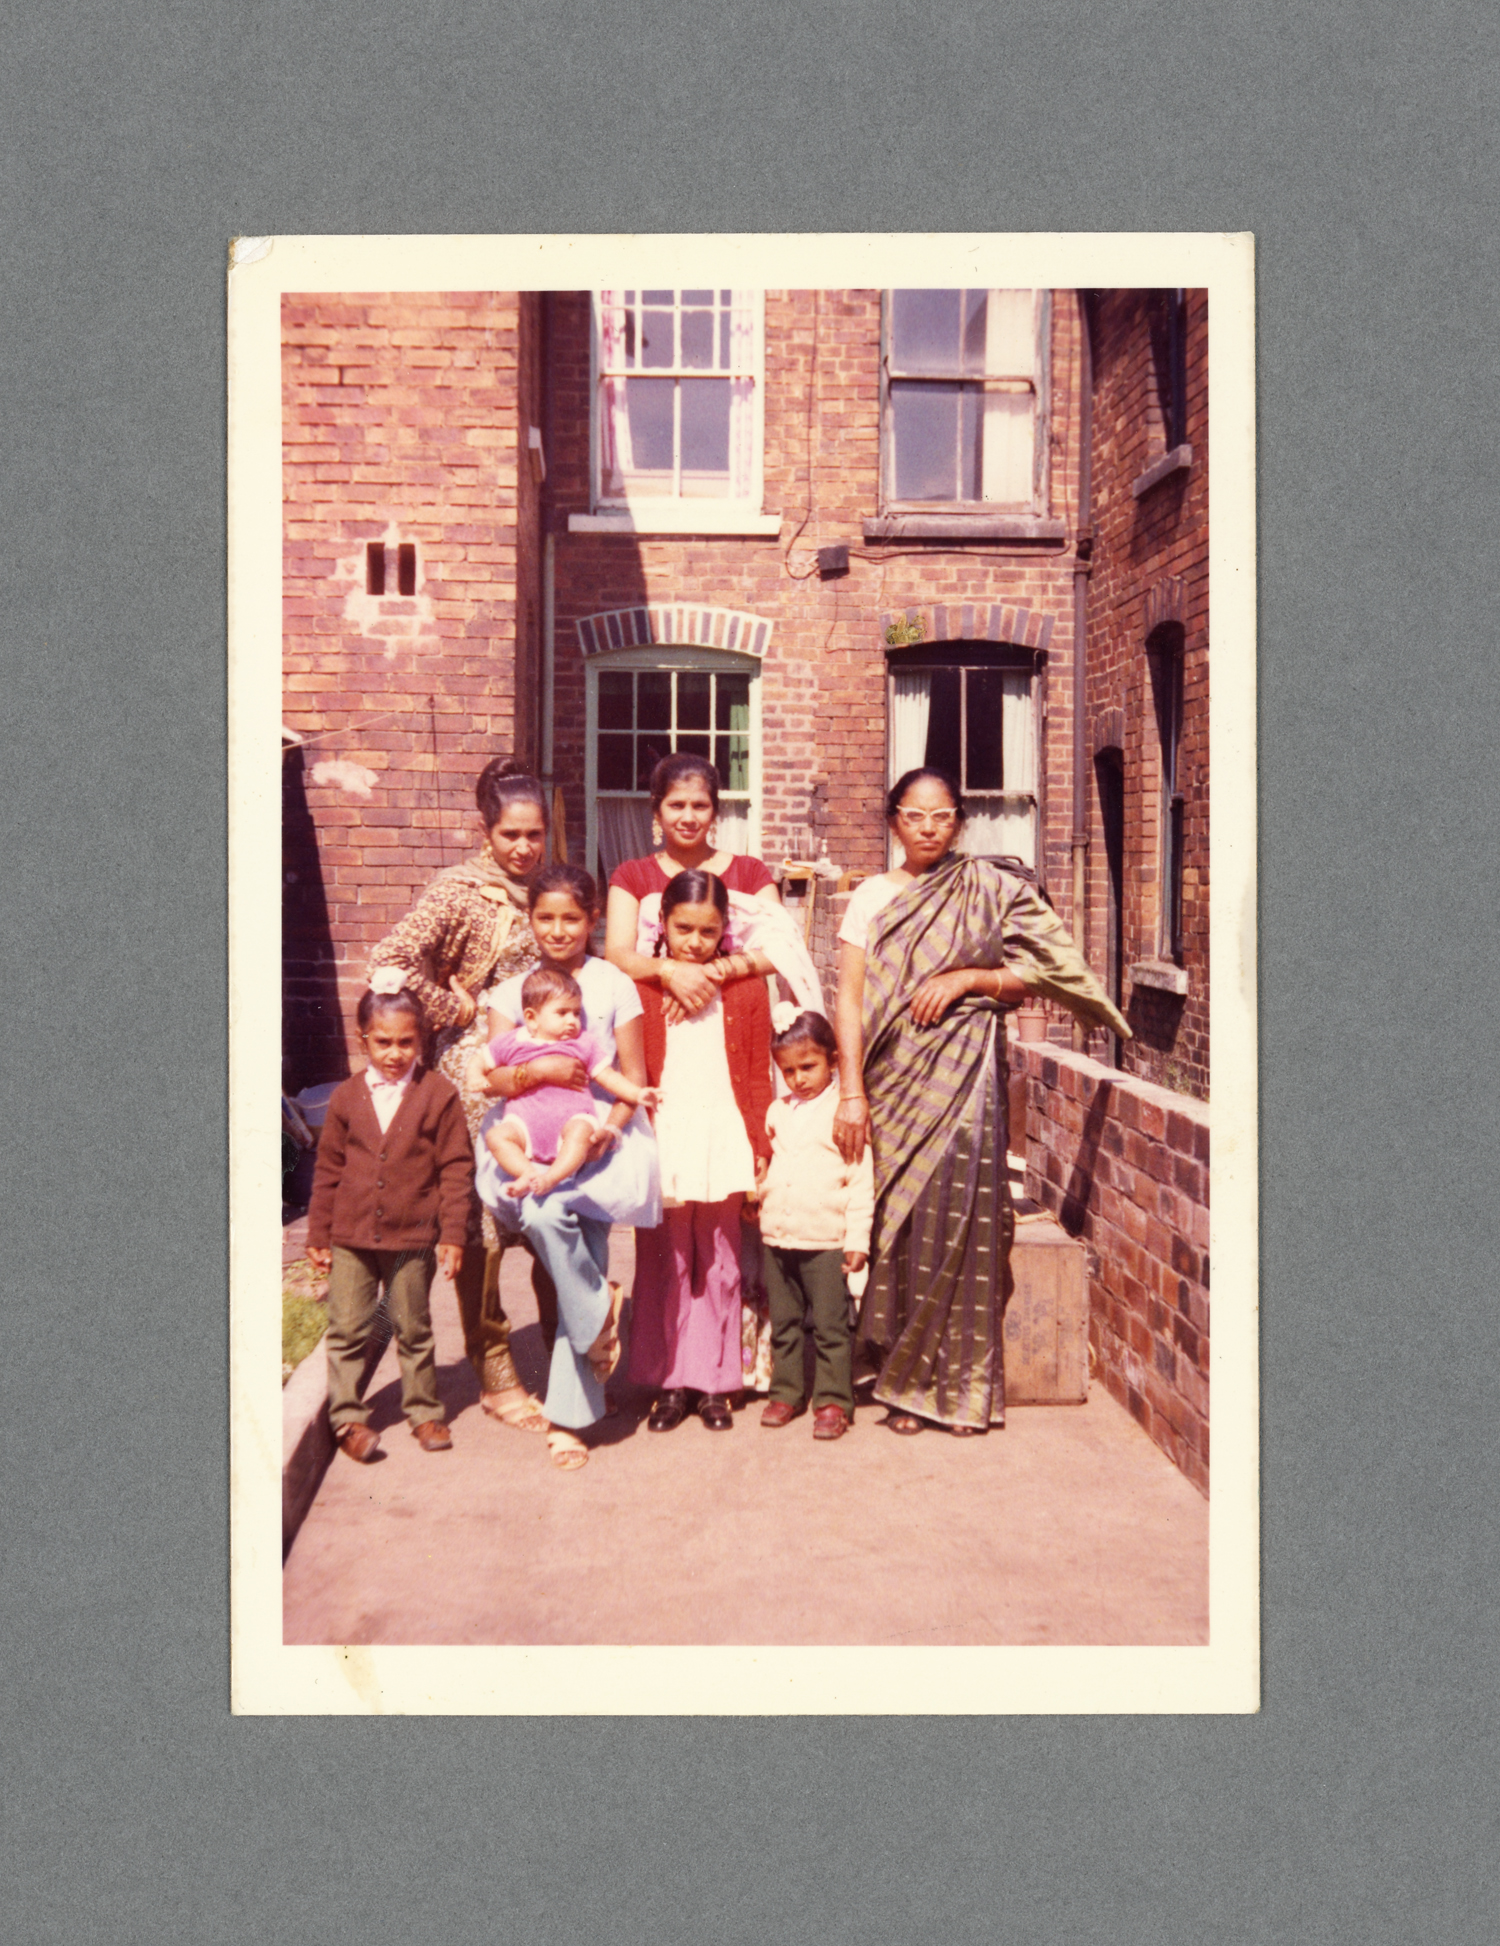 Willenhall Rd. c.1971